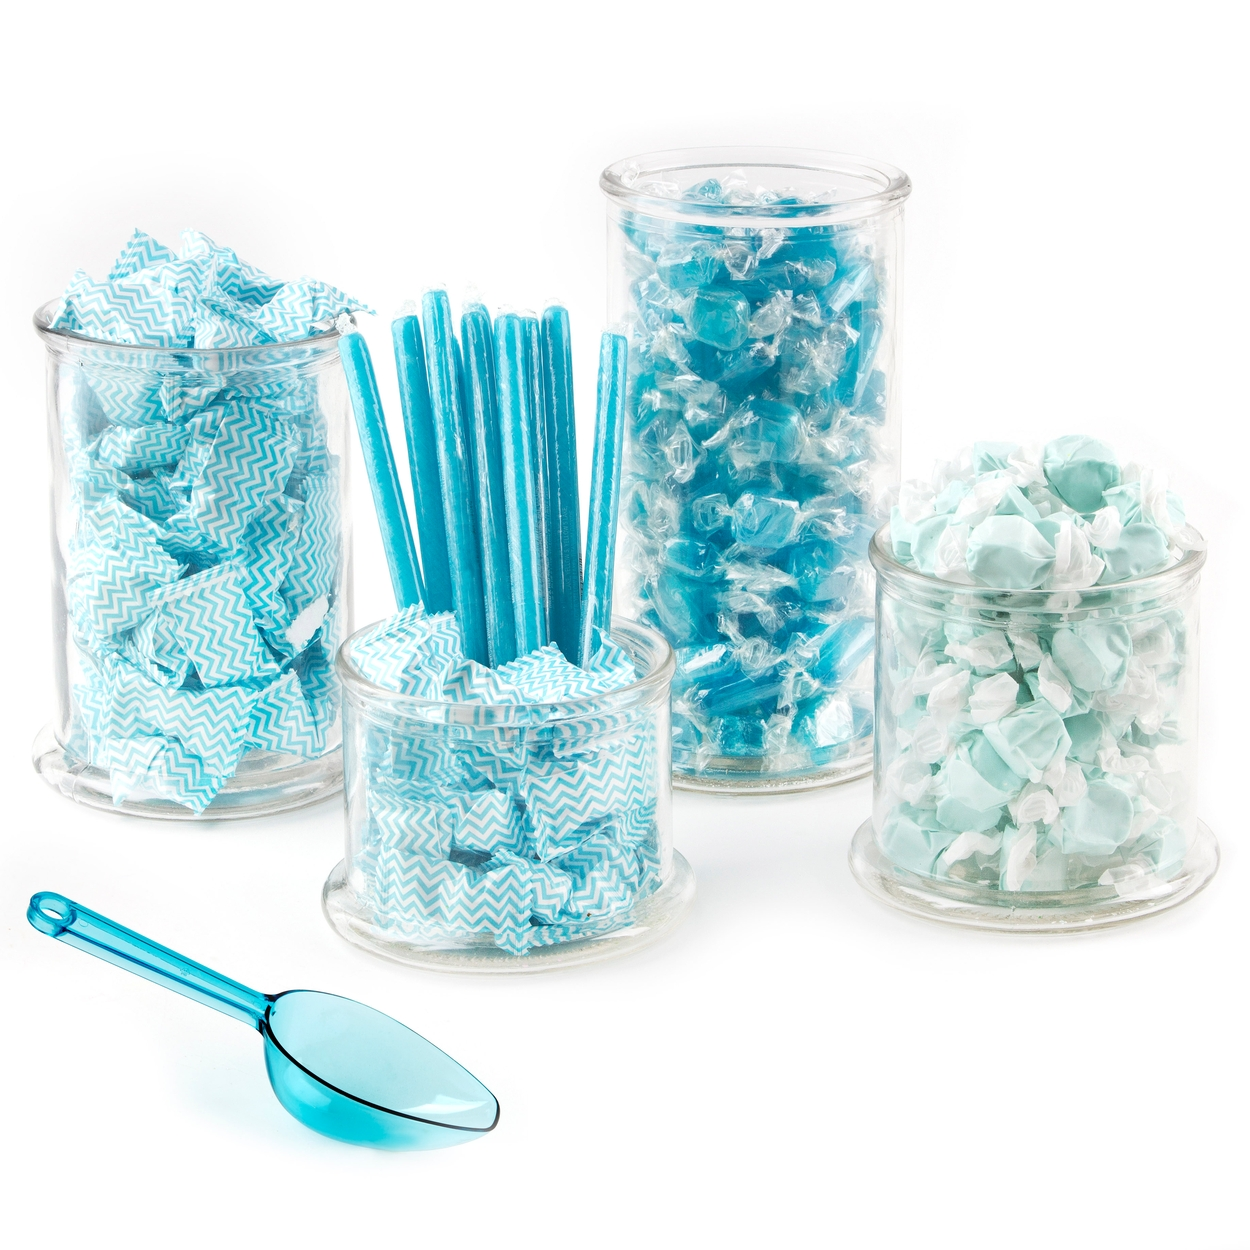 blue candy buffet kit u2022 candy buffet kits u2022 bulk candy u2022 oh nuts rh ohnuts com Candy Store Buffet cheapest bulk candy for candy buffet